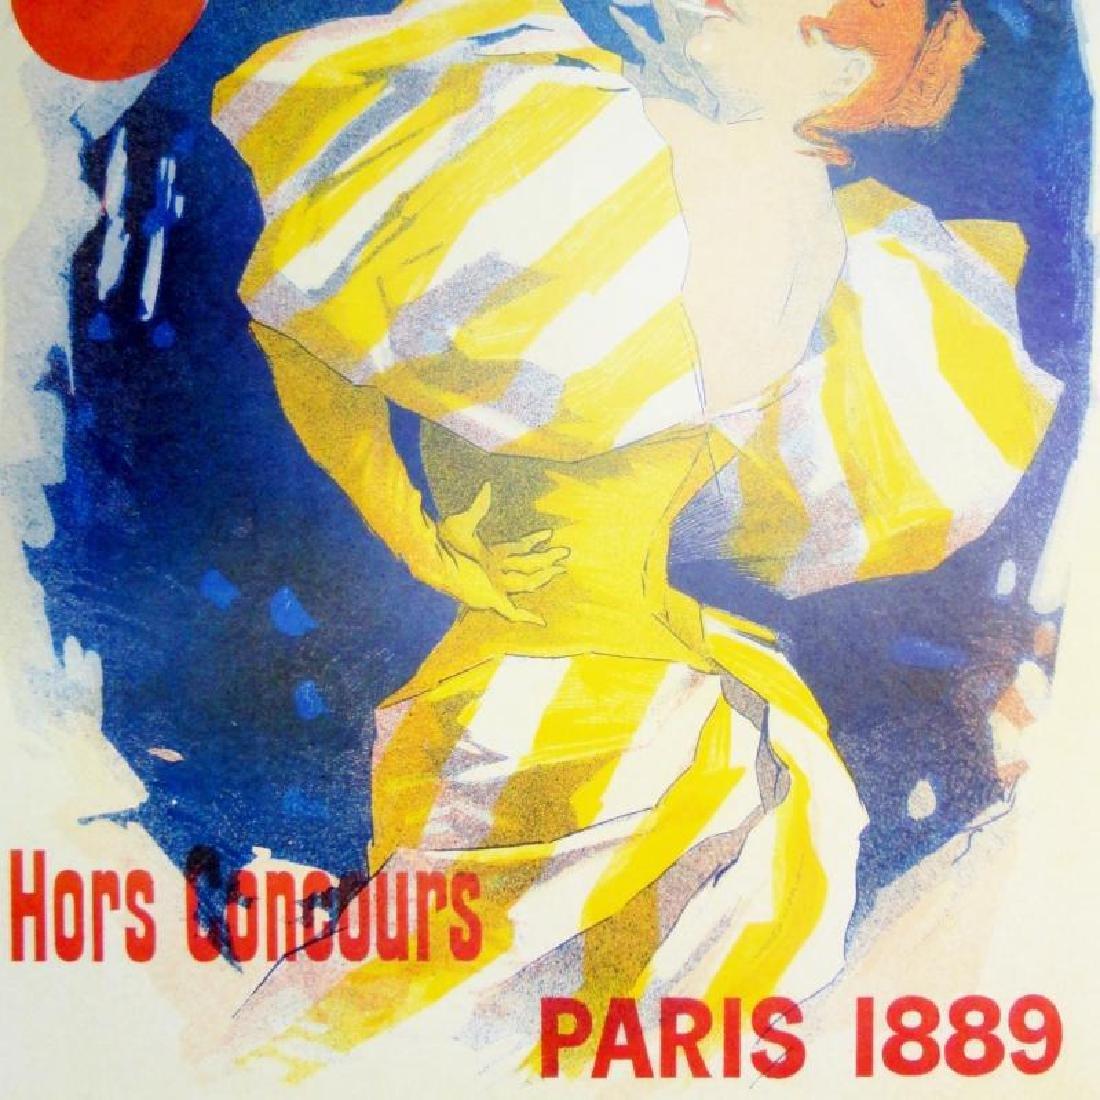 Job Cigarettes Antique Poster Rare Reproduction Huge - 2